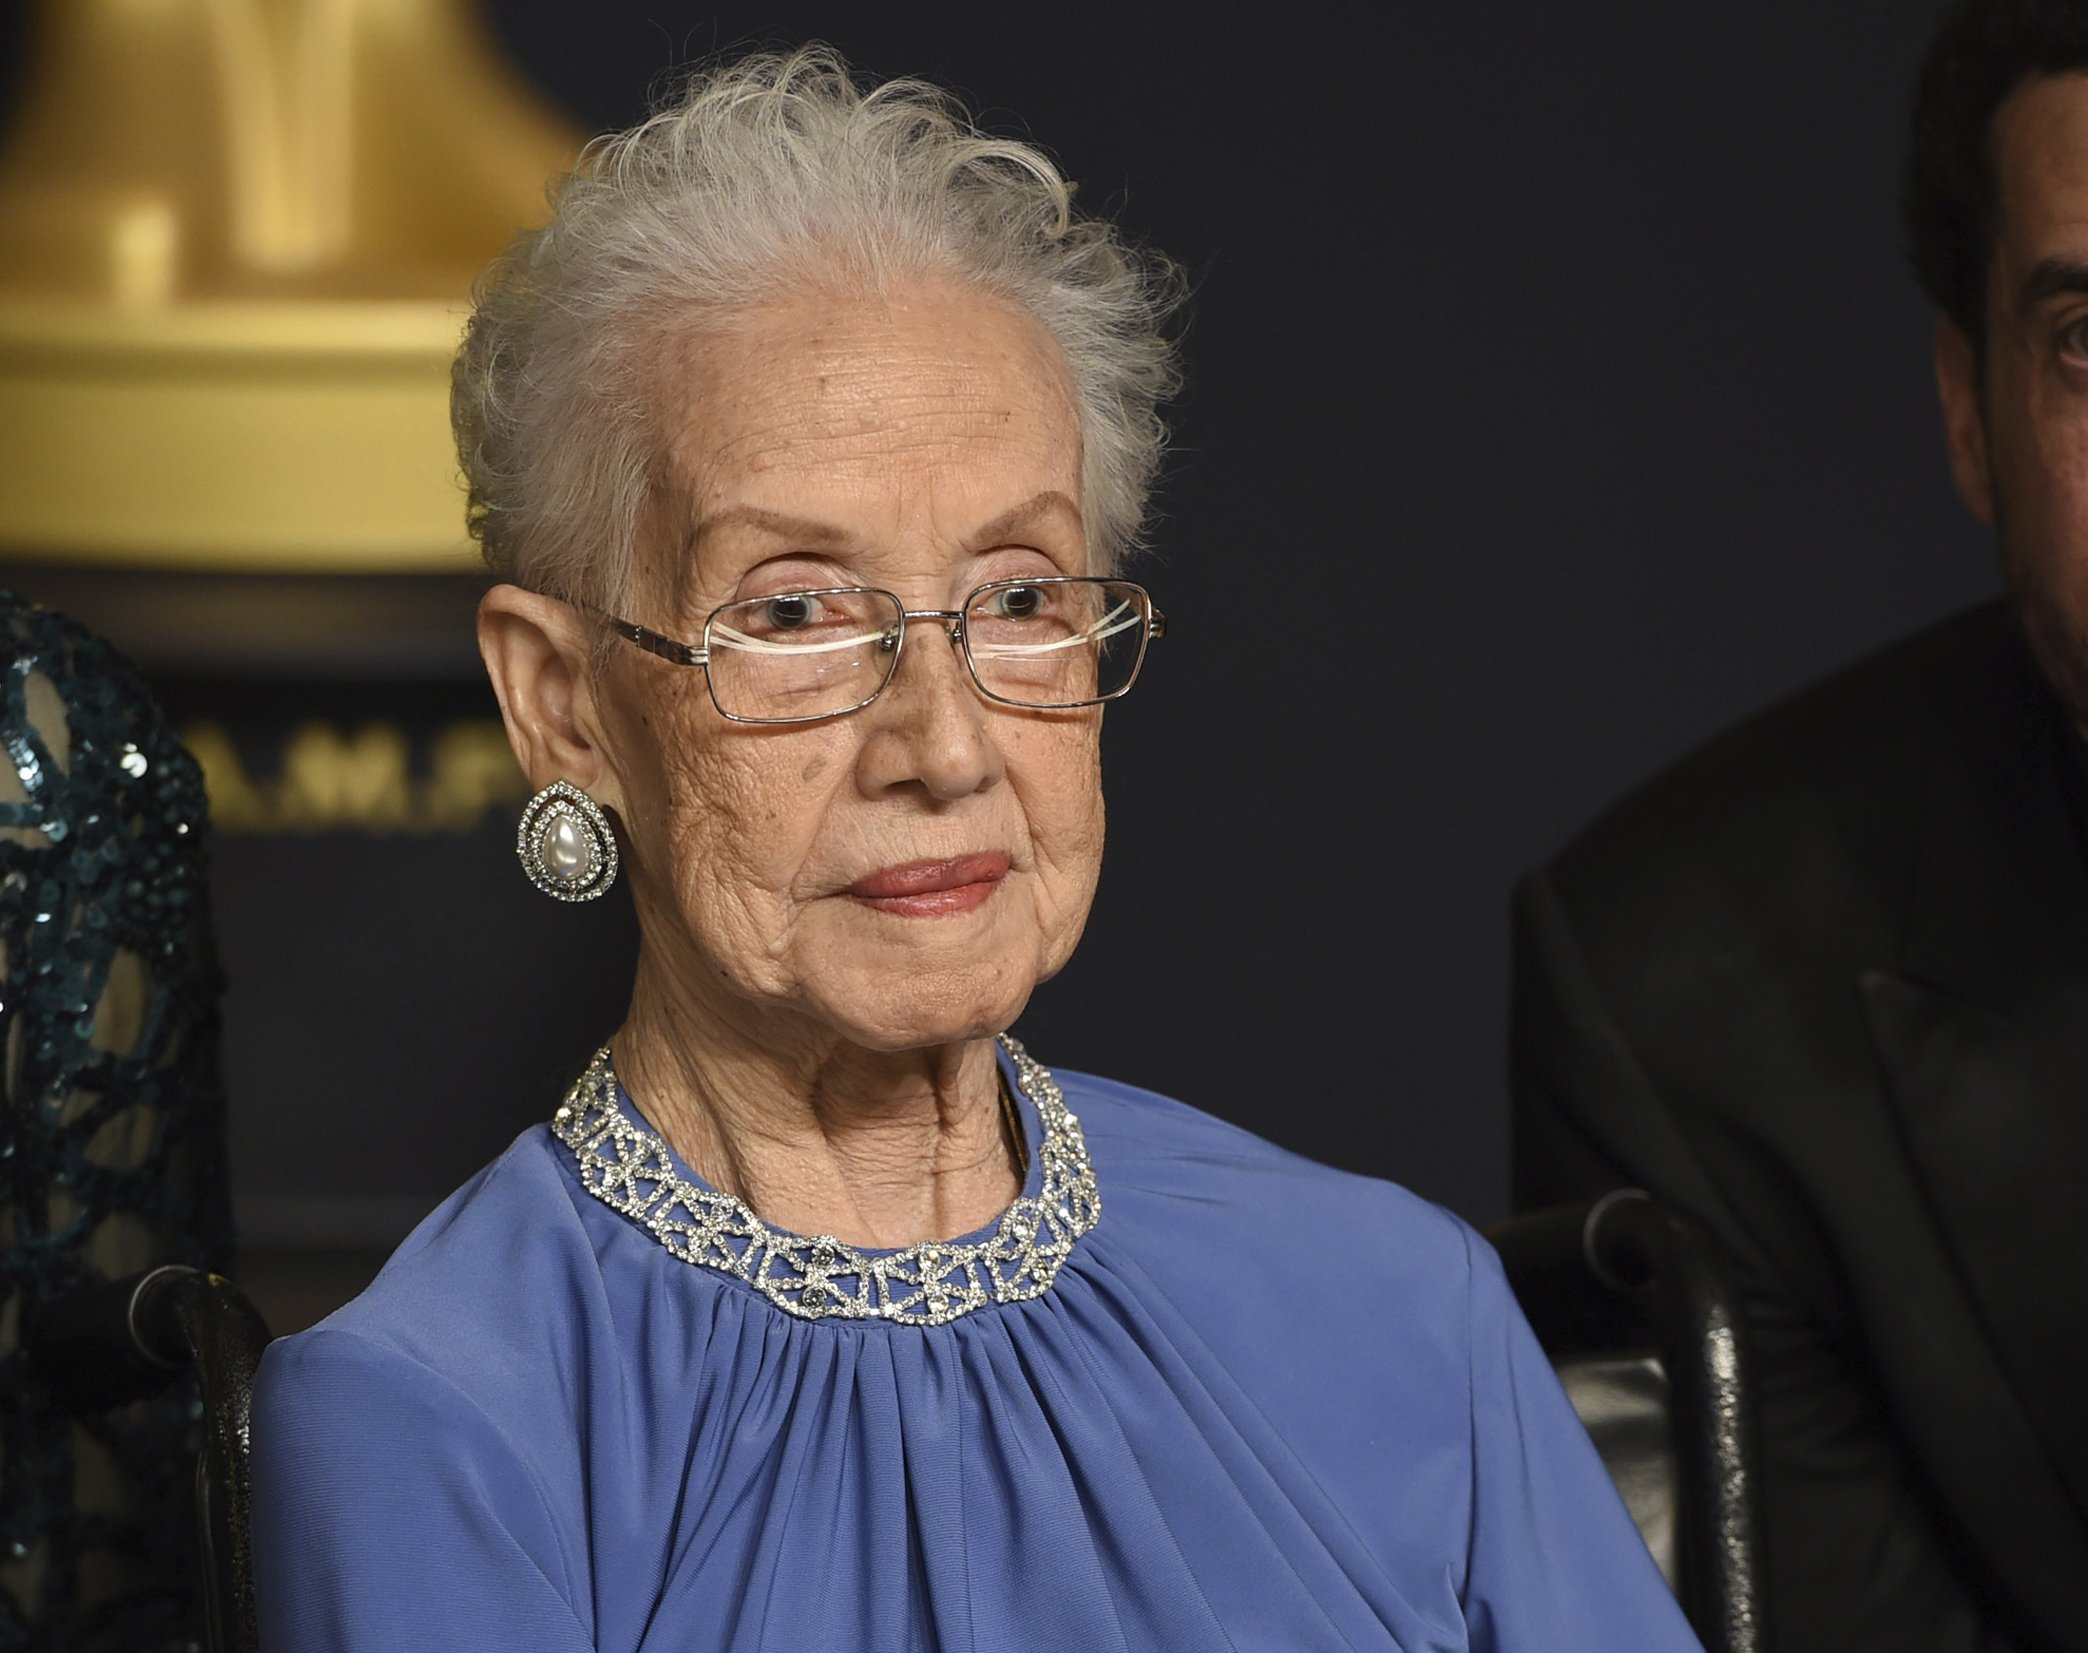 NASA mathematician Katherine Johnson being honored in bronze